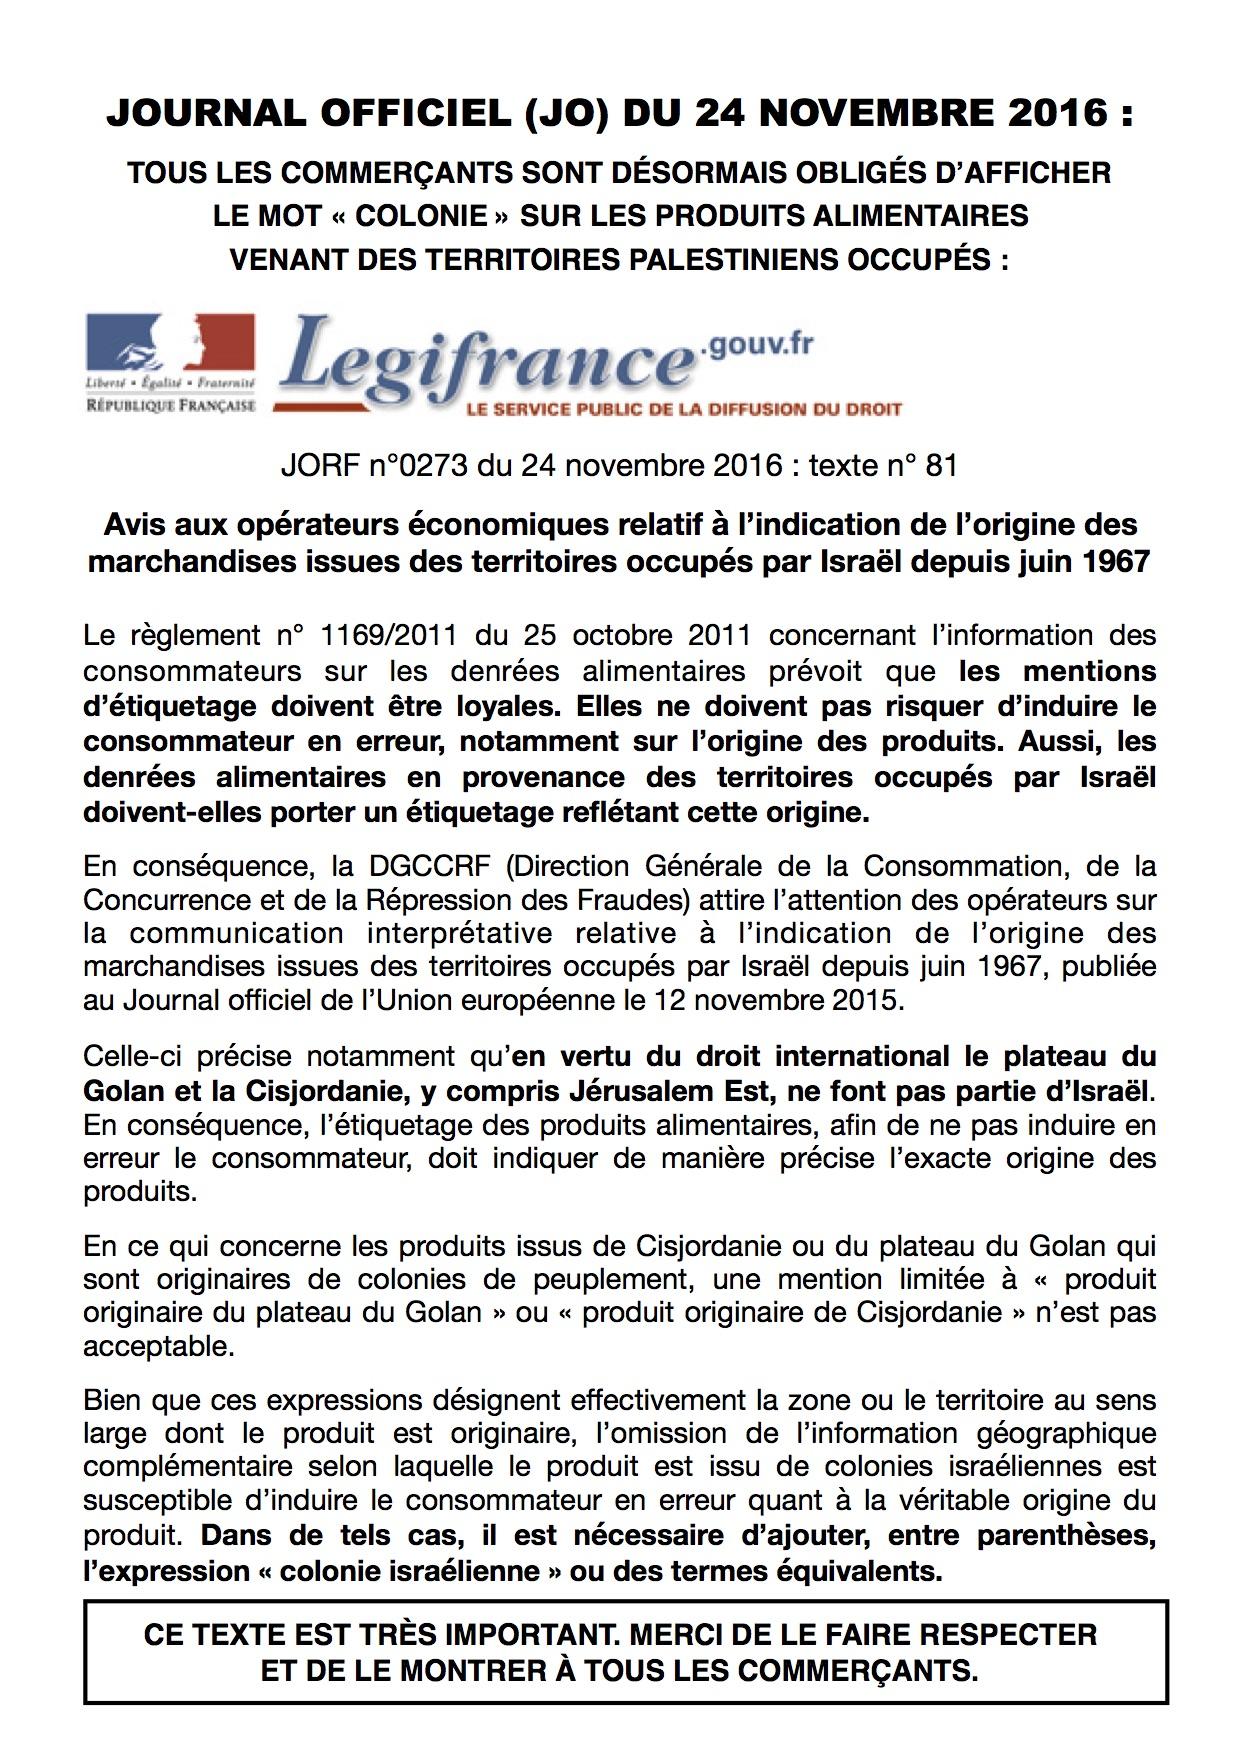 _journal_officiel_grand_format-2.jpg